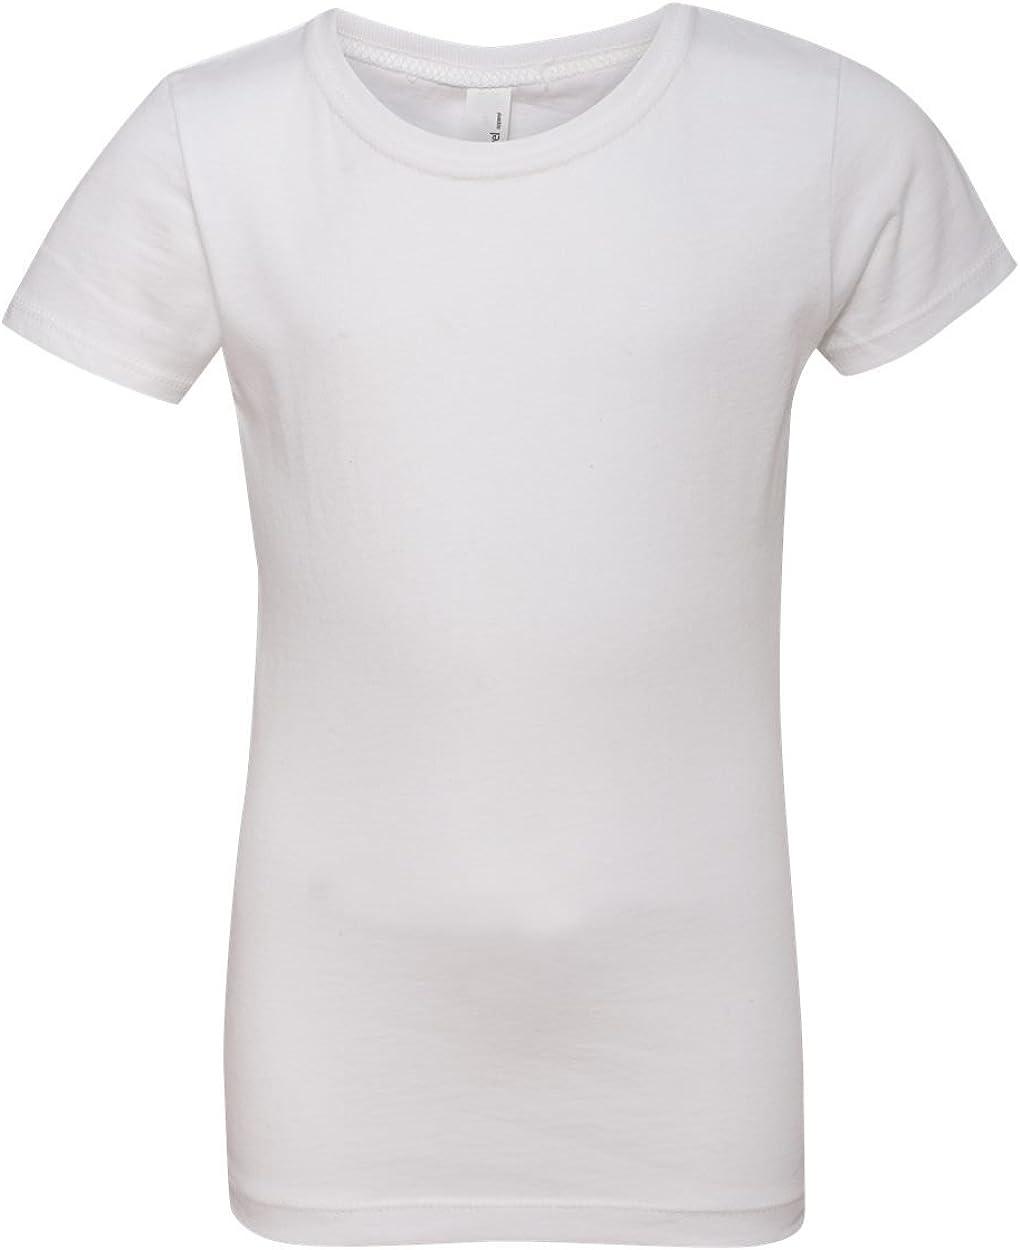 Next Level Girls' Princess Tee (White) (S)